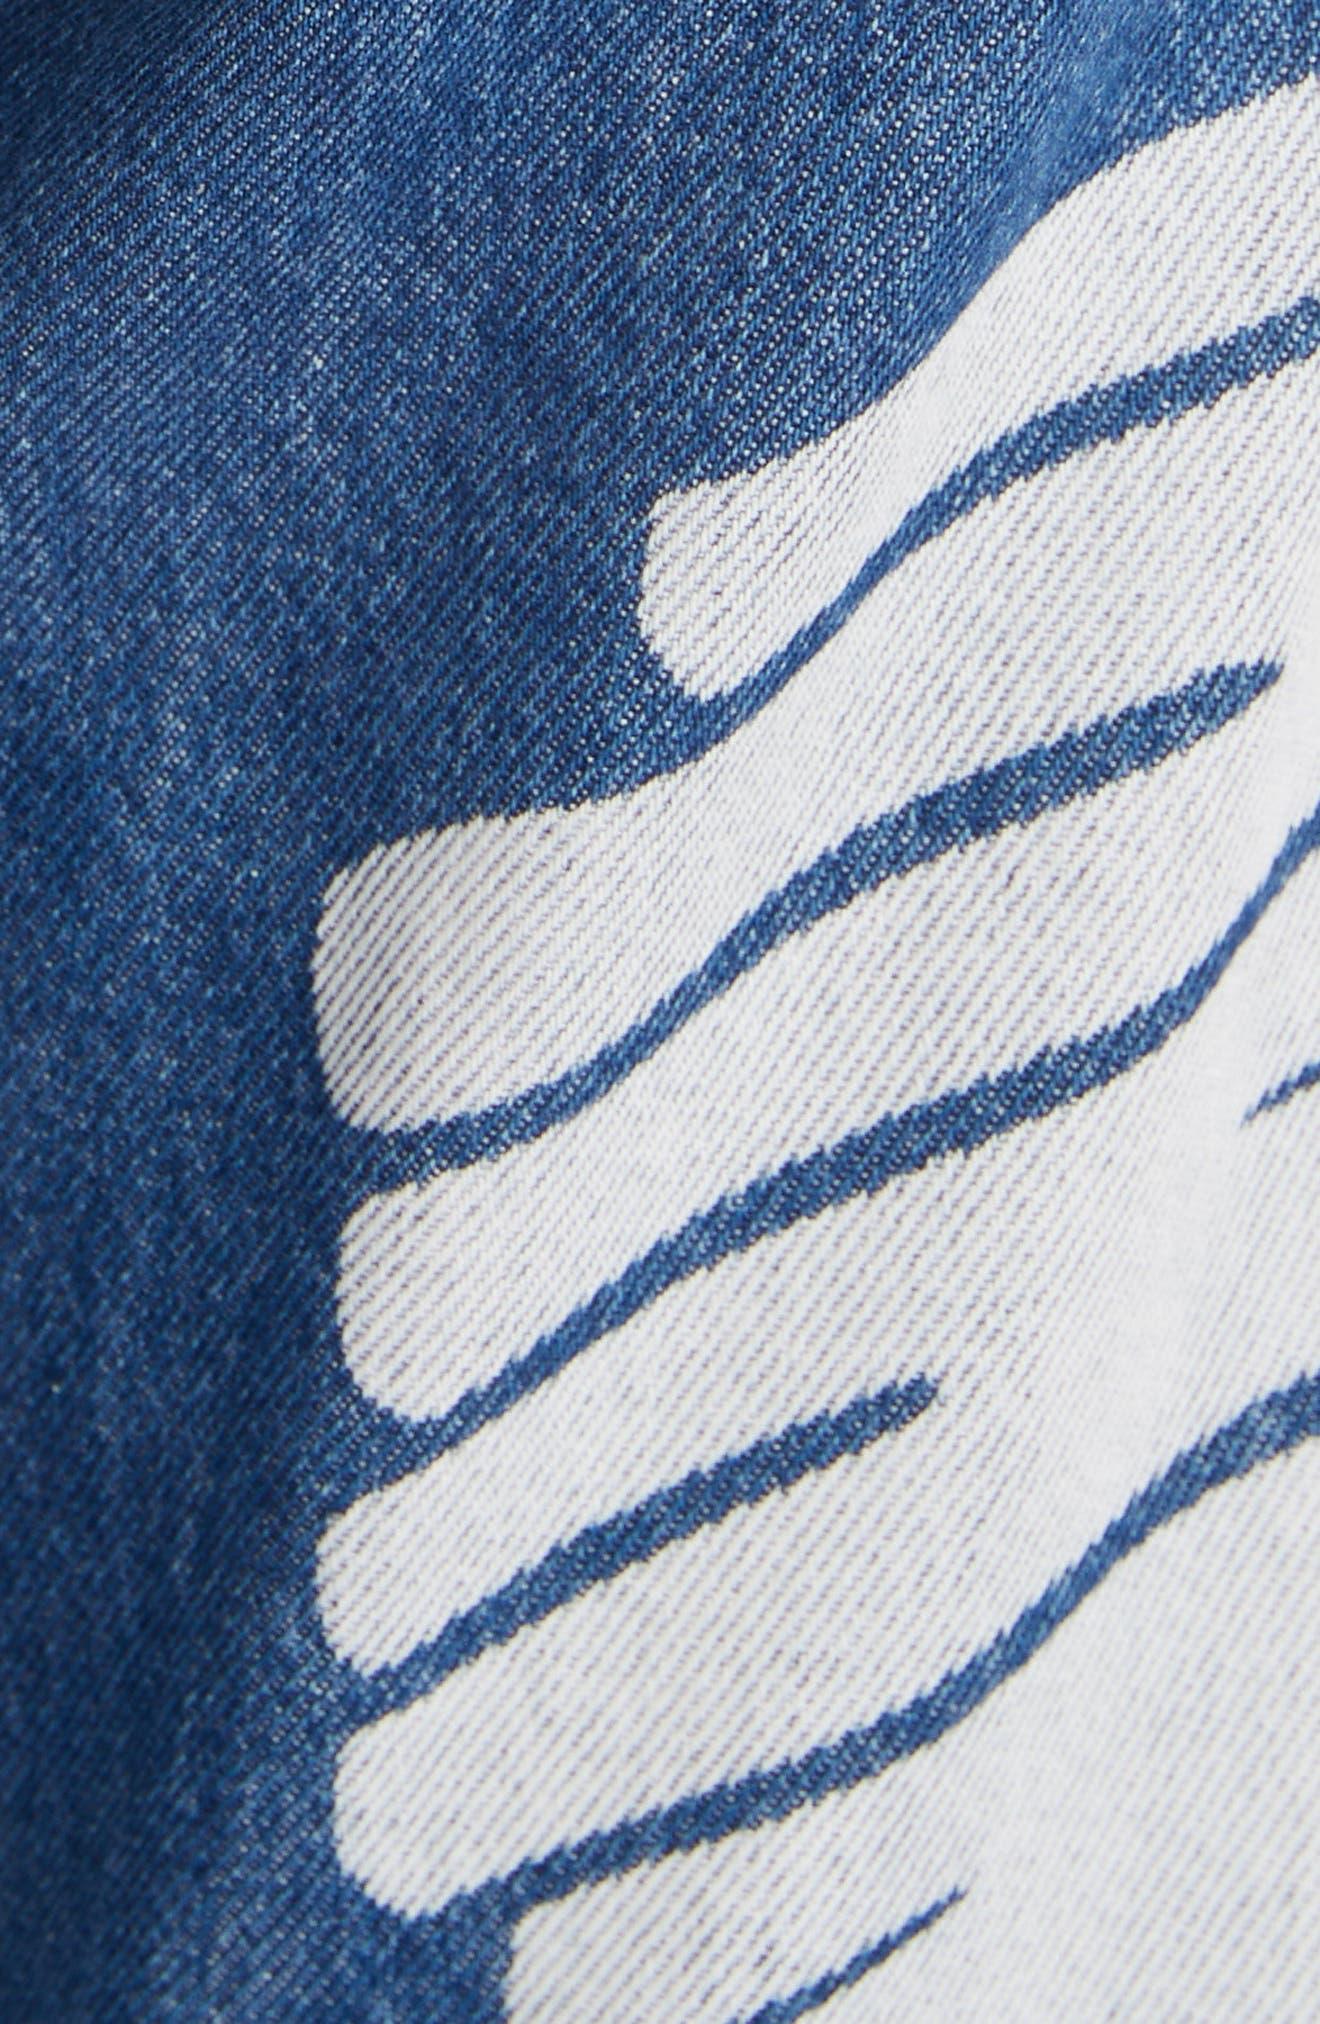 MOSCHINO, Scribble Straight Leg Jeans, Alternate thumbnail 5, color, DENIM